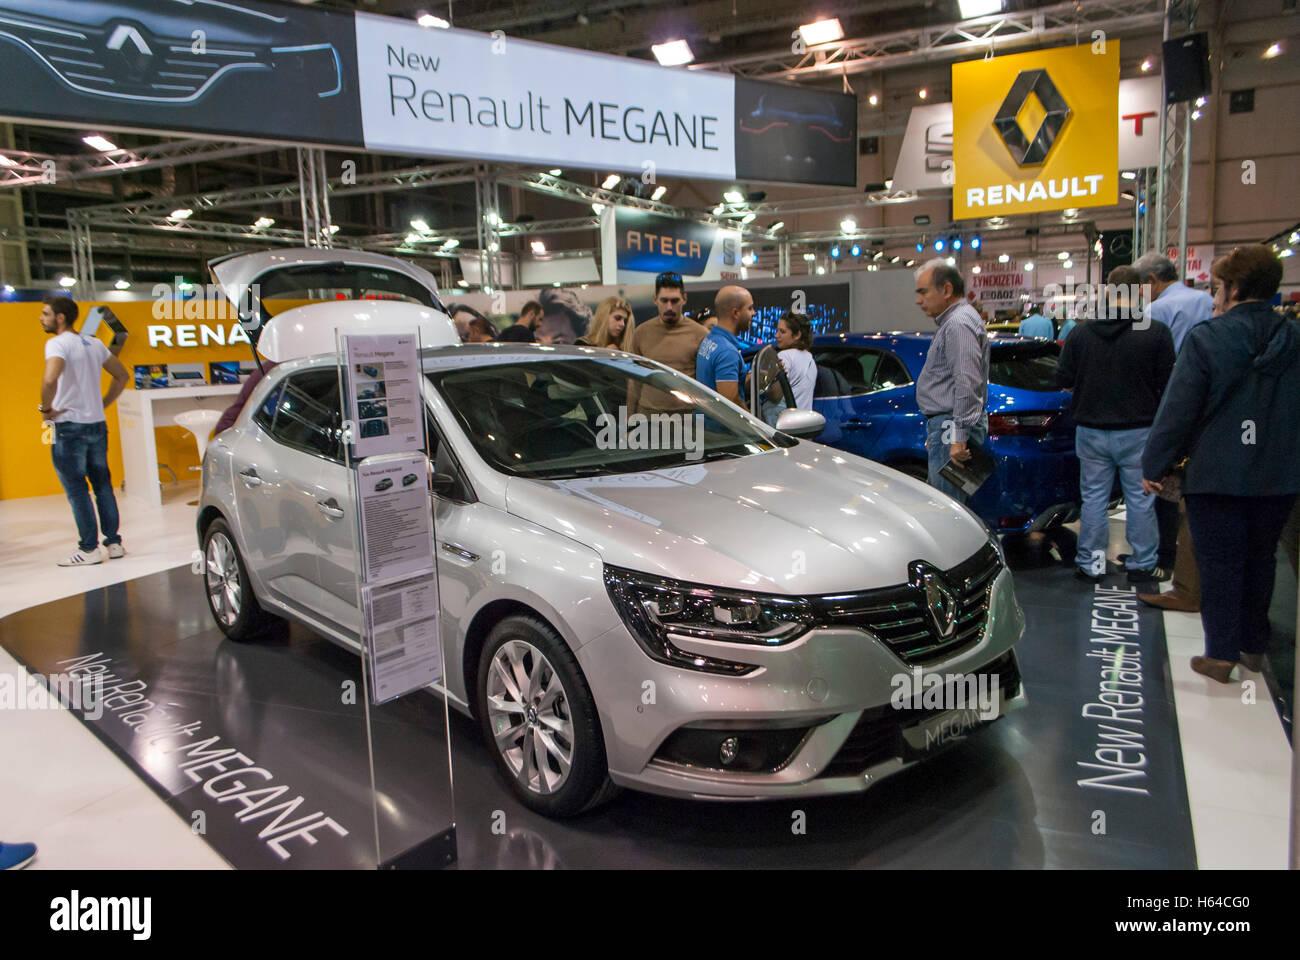 Renault Car Accessories Stockfotos & Renault Car Accessories Bilder ...